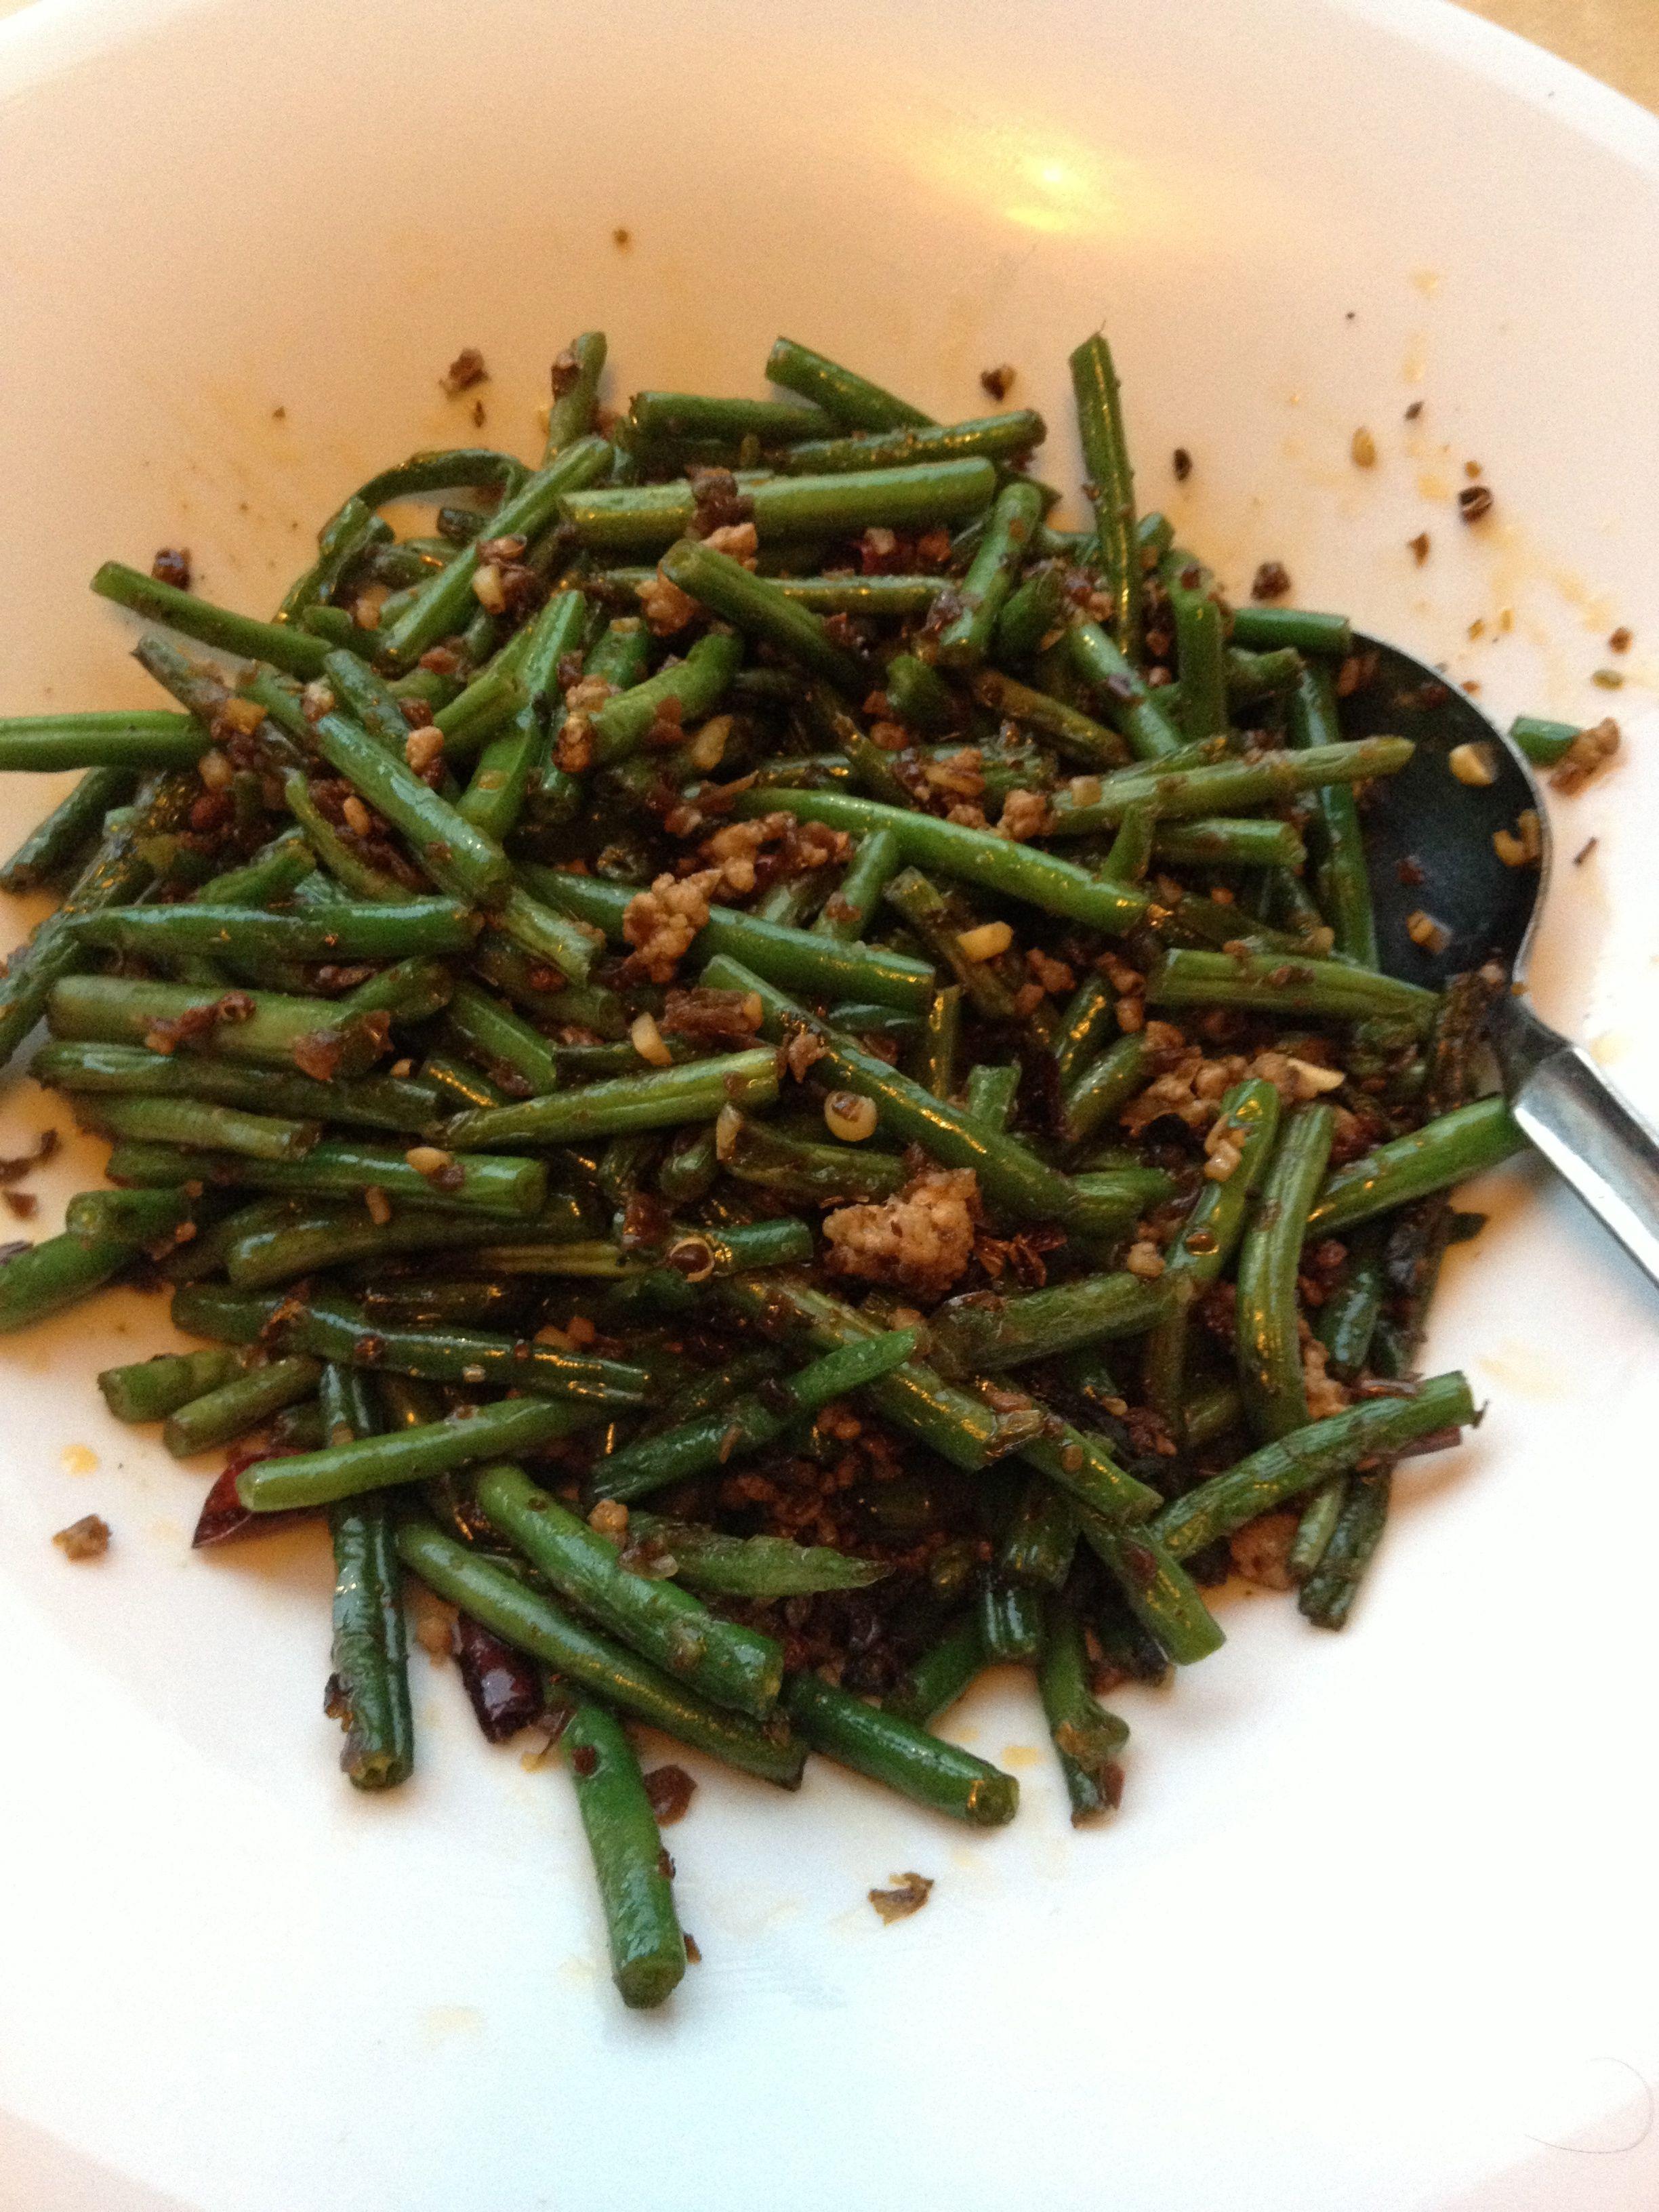 Sichuan fried green beans to celebrate Dermot's arrival in Dublin ...